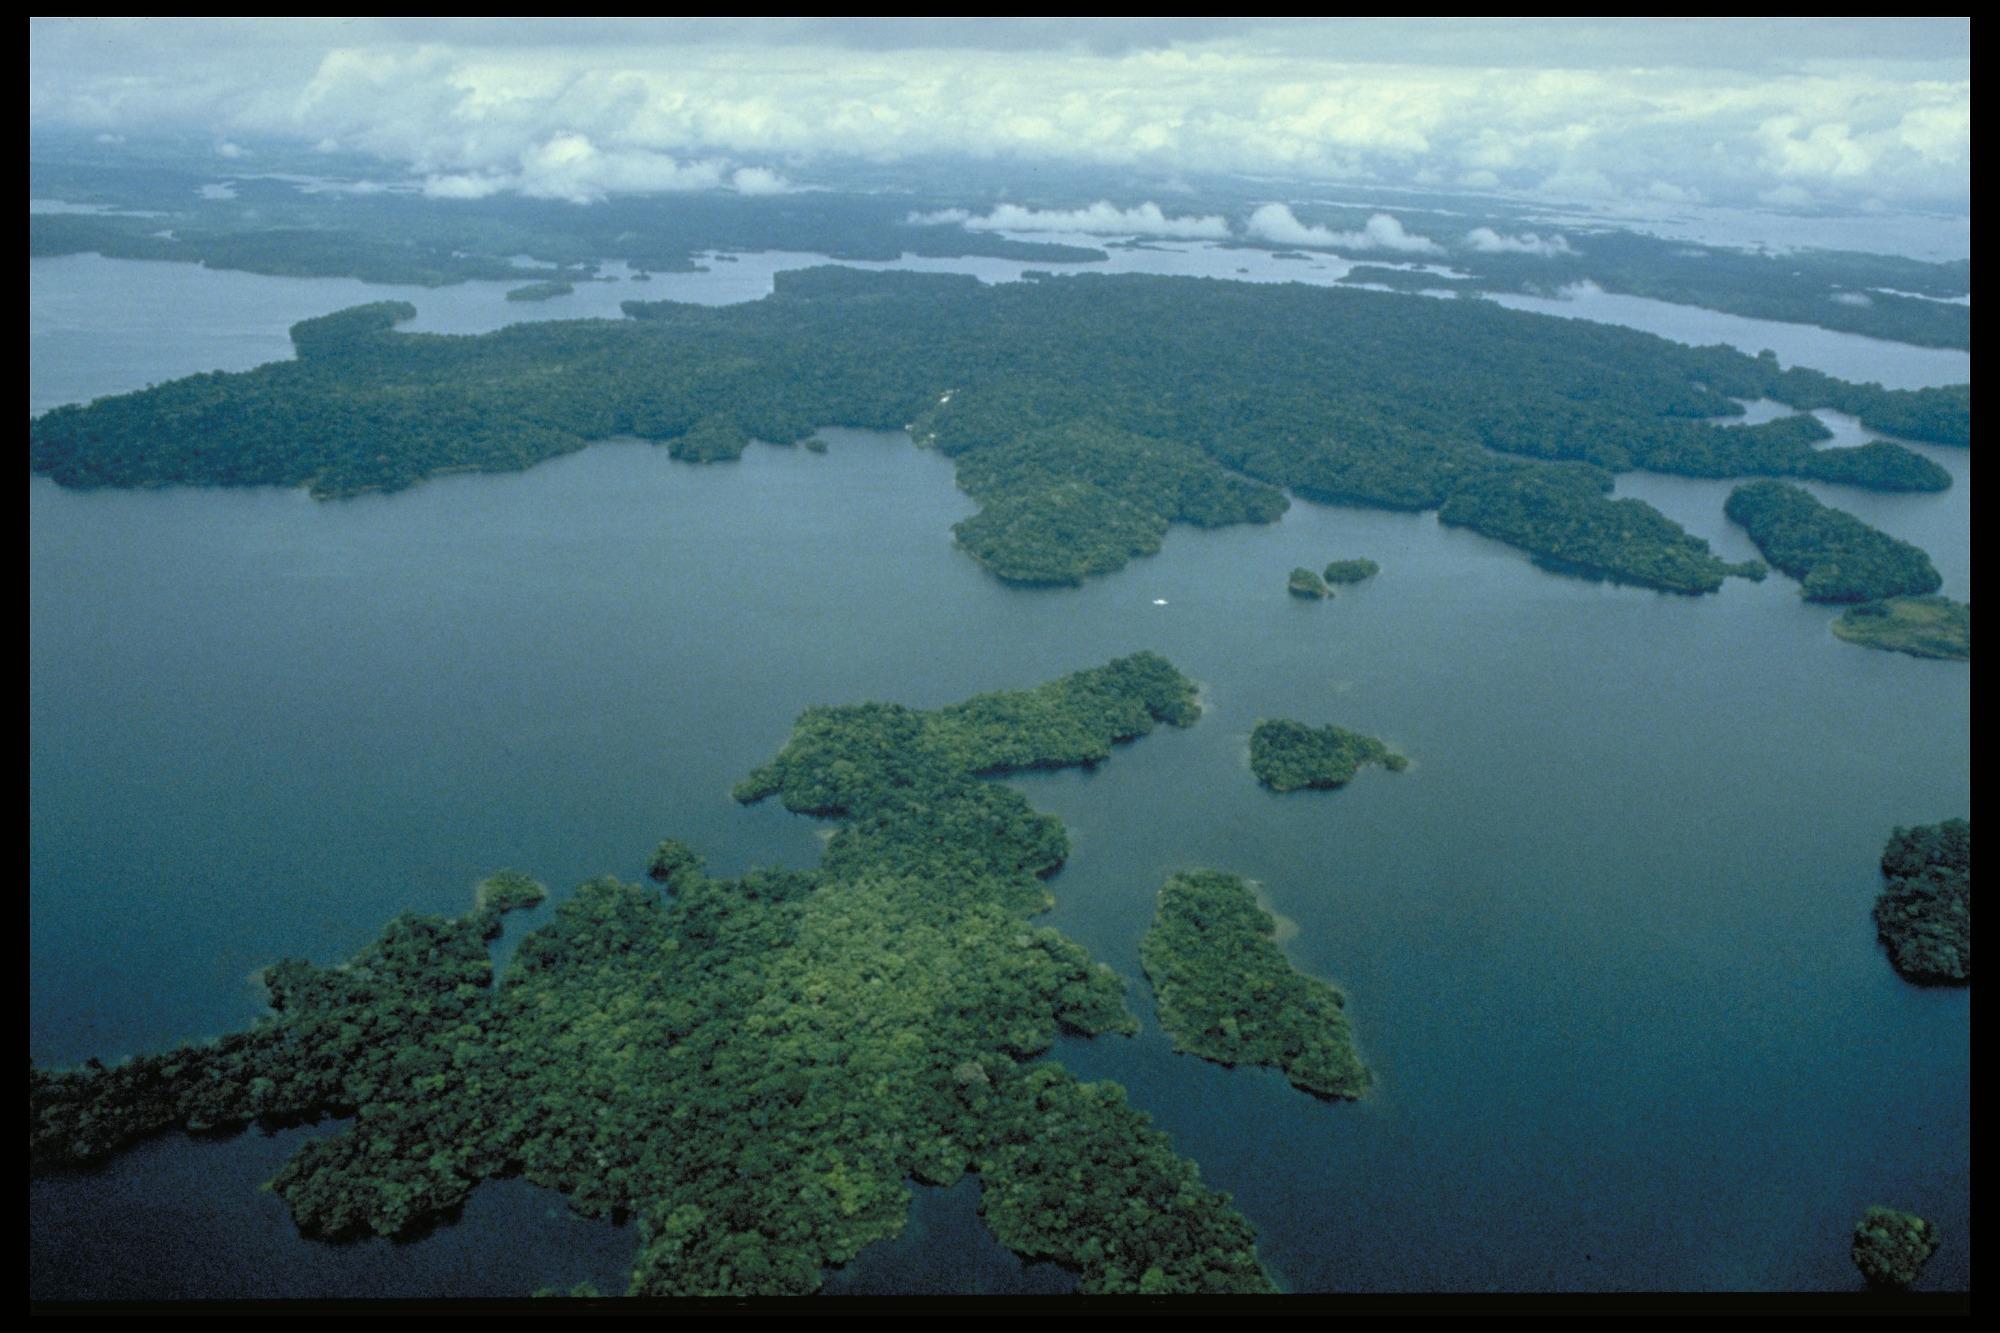 Aerial view of Barro Colorado Island (BCI), Panama, STRI